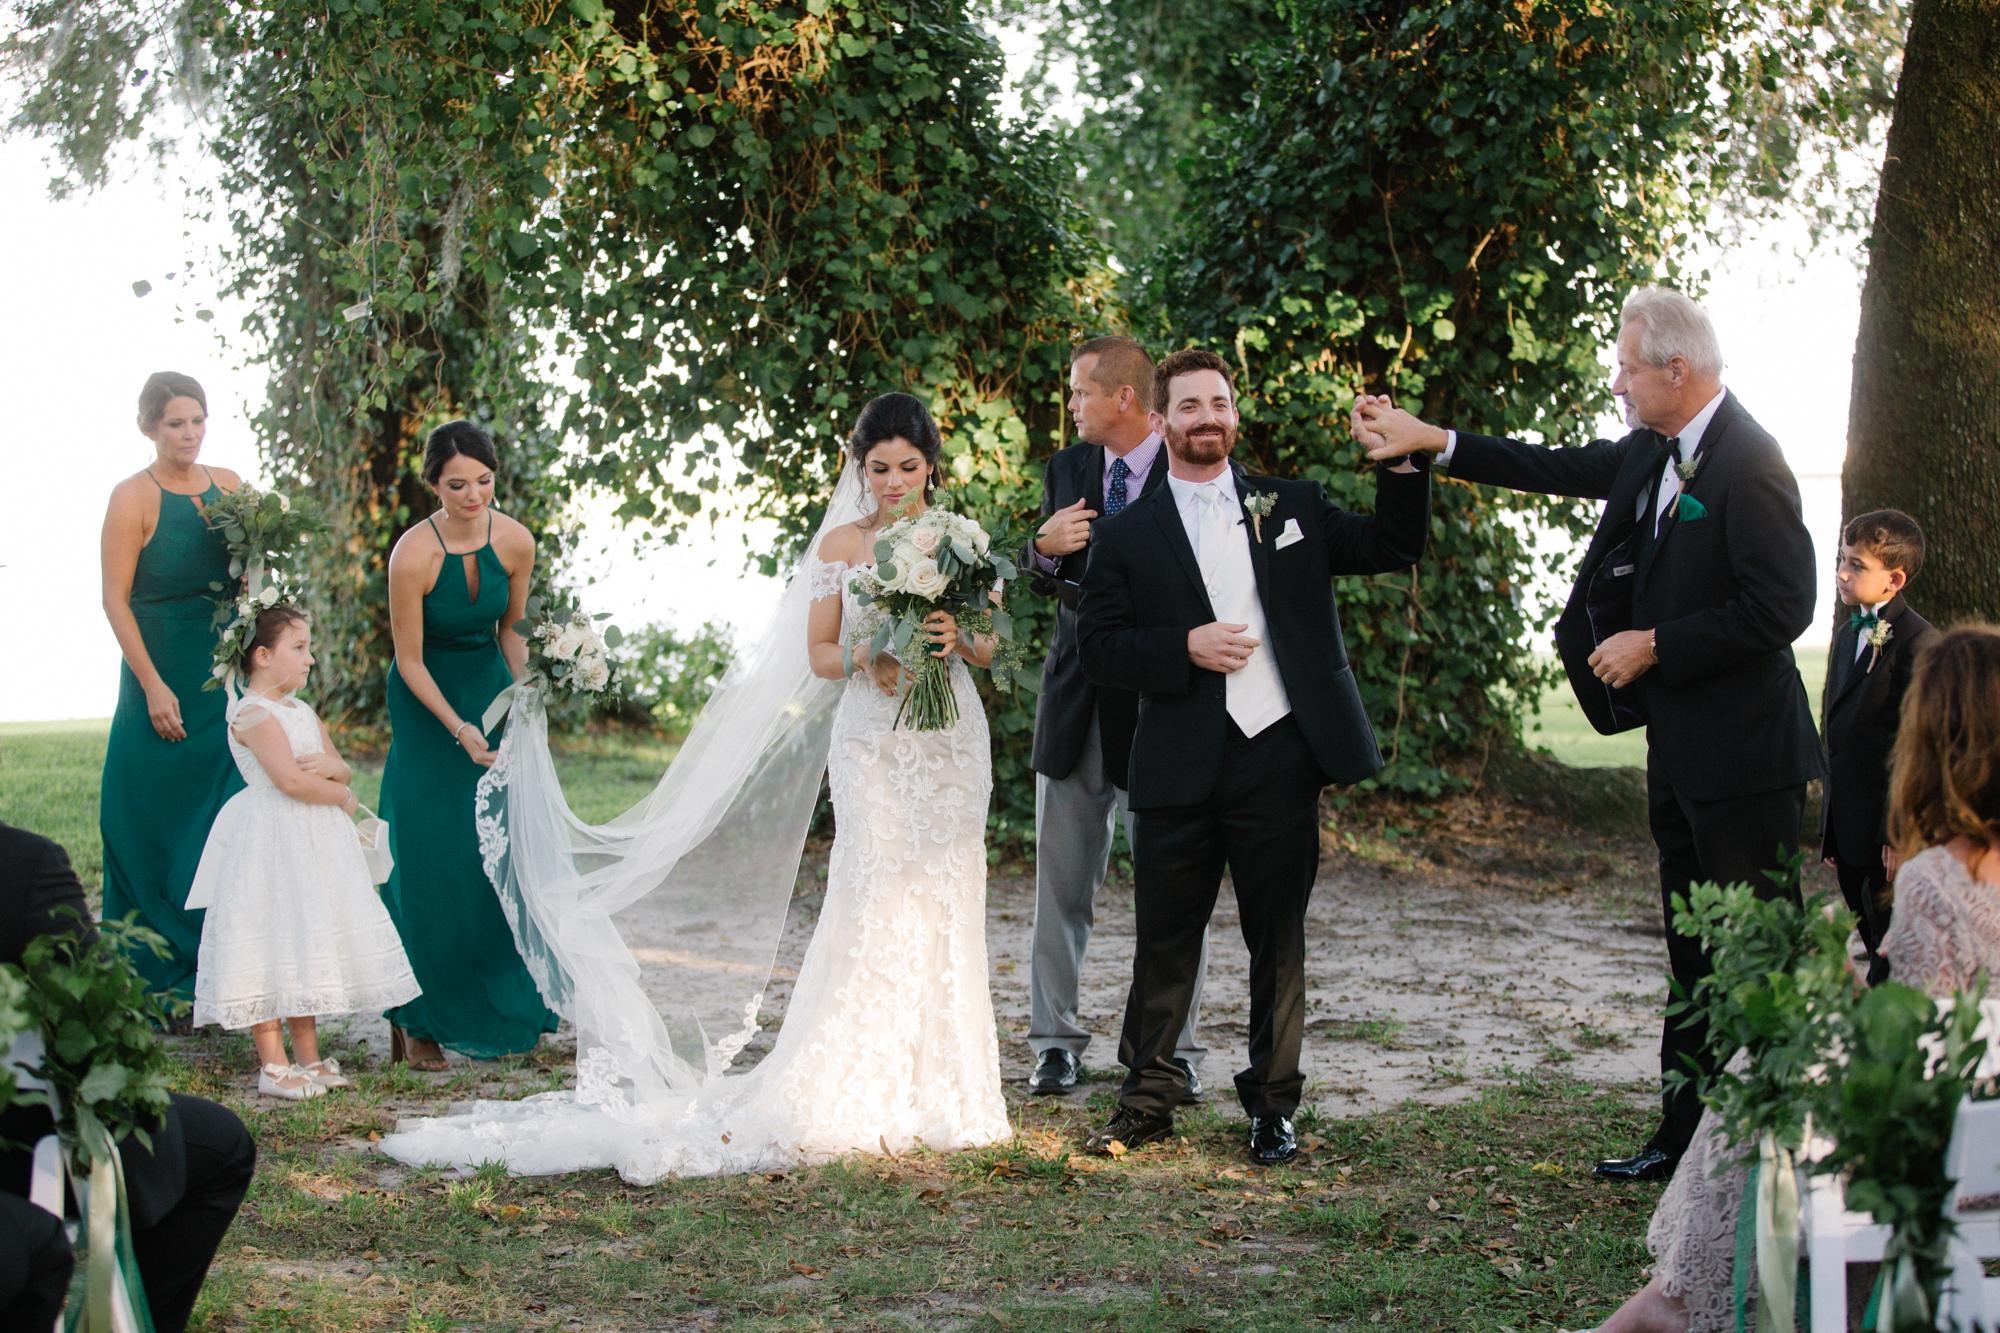 Gautier_Wedding_Photographer-124.jpg